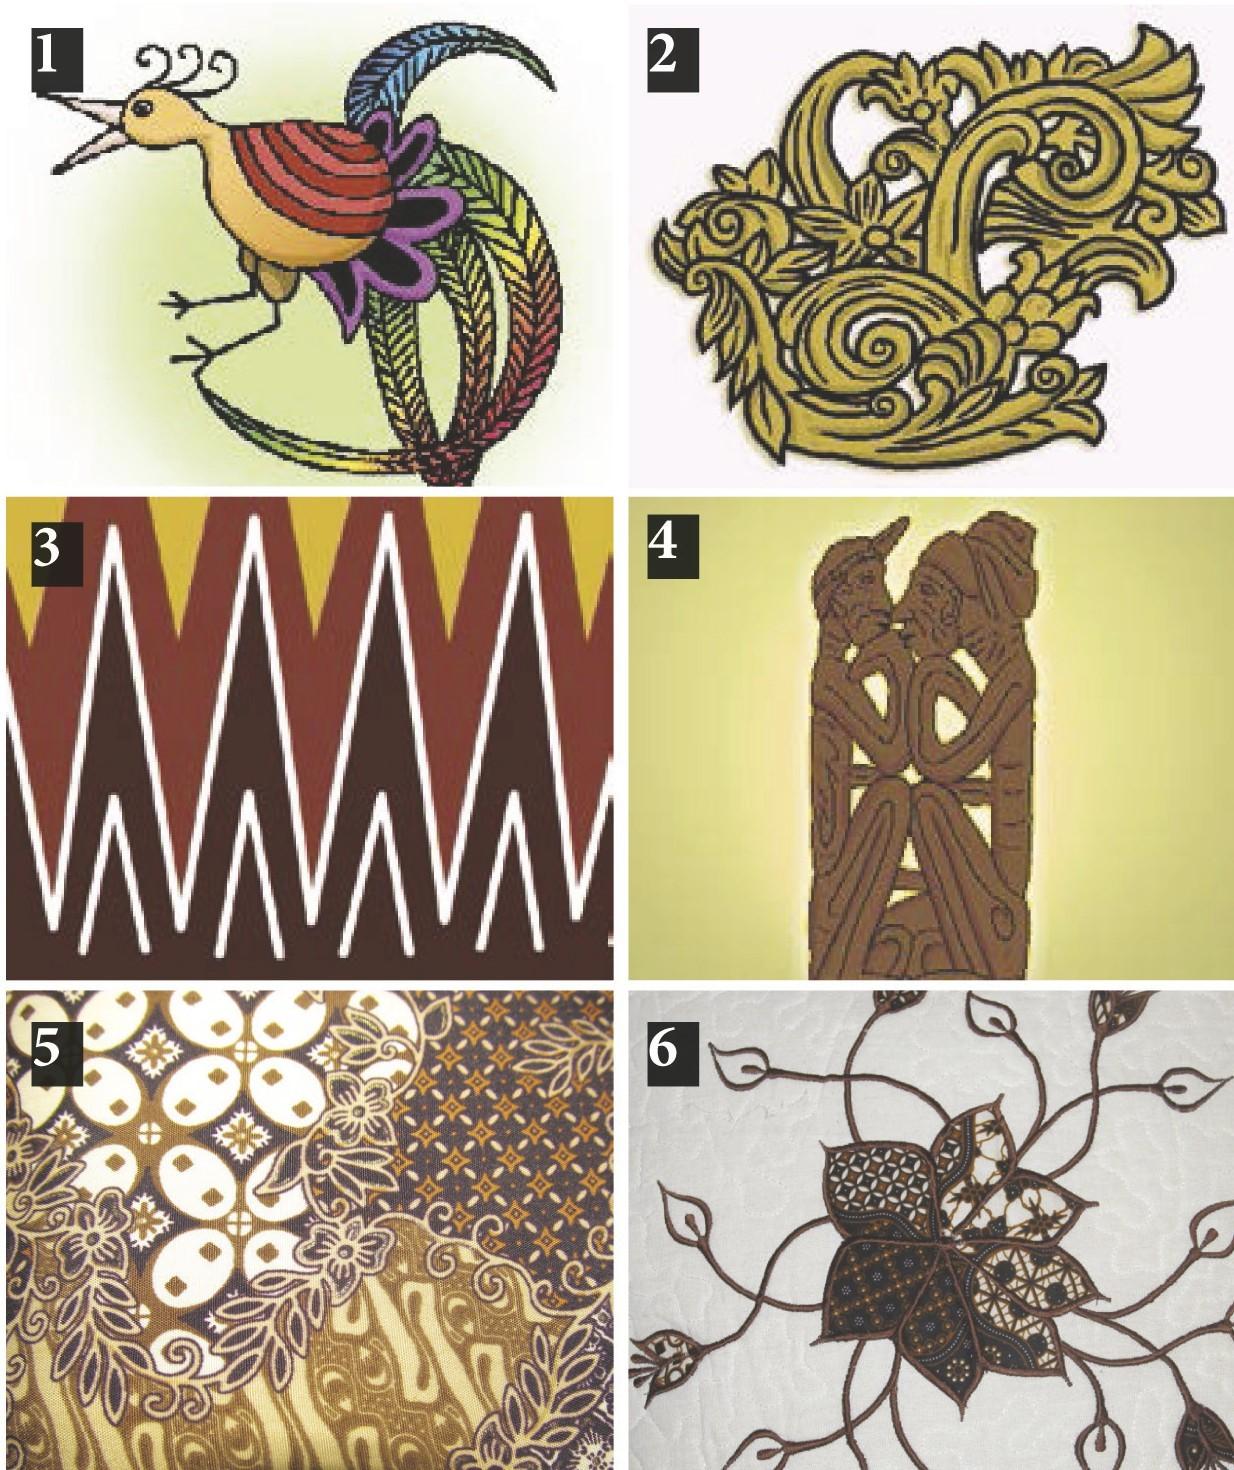 106 Gambar Ragam Hias Sketsa Geometris